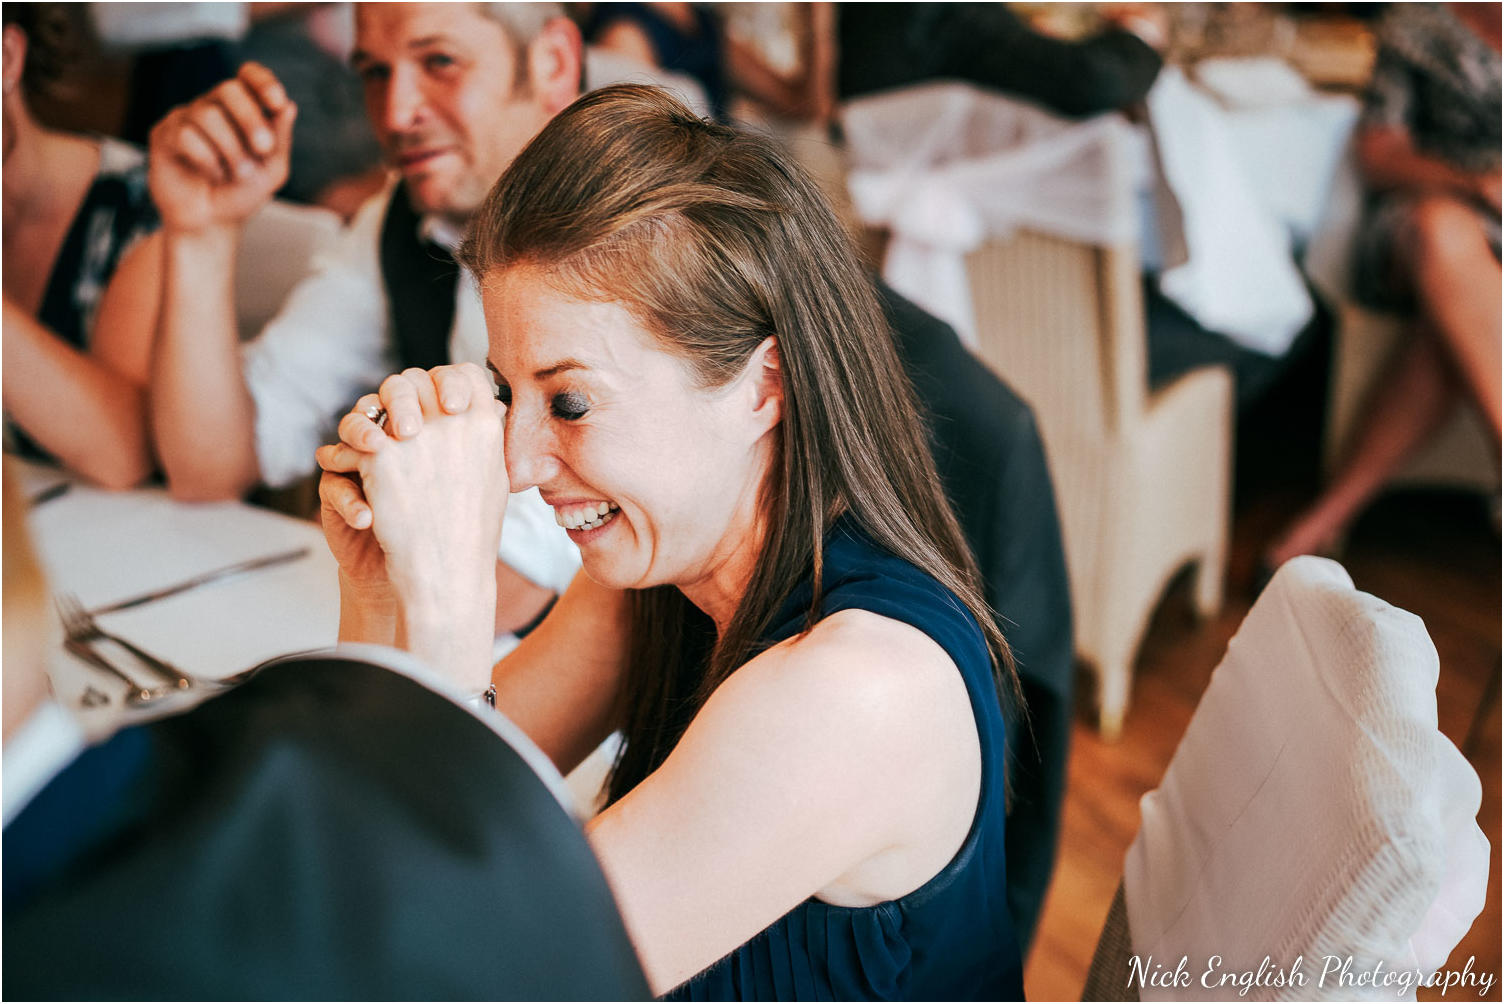 Mitton_Hall_Wedding_Photograph-120.jpg